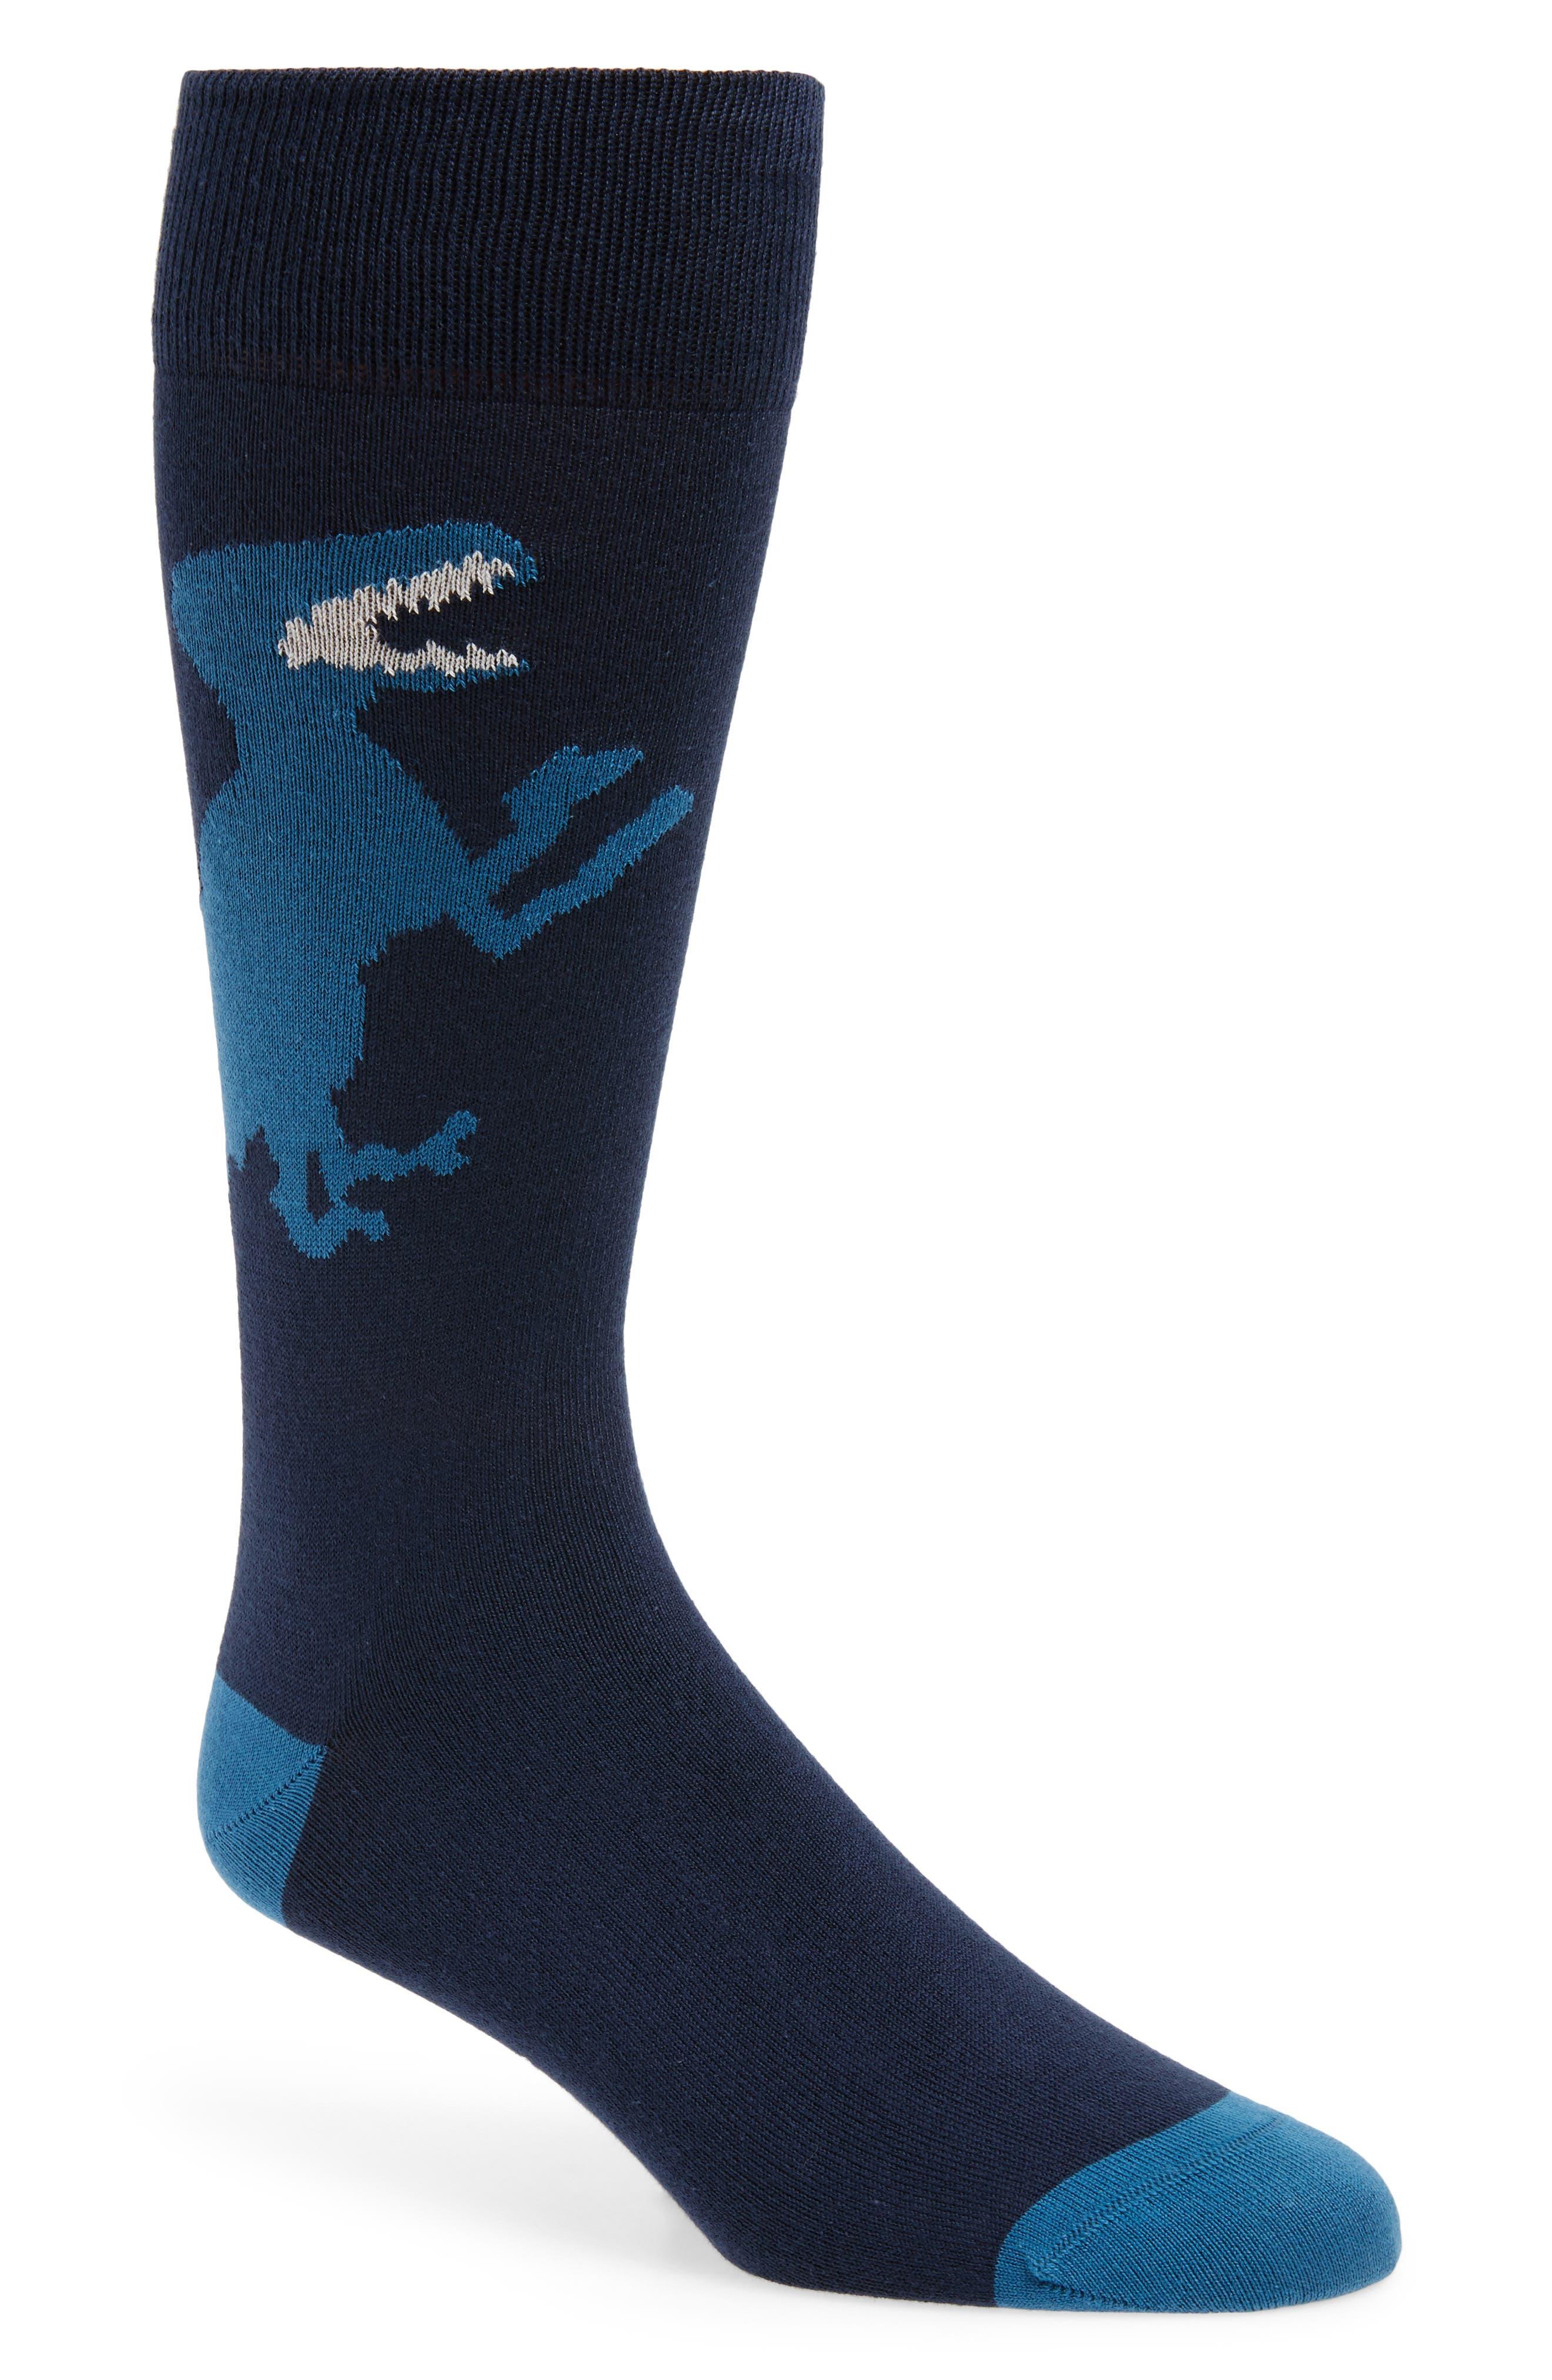 Big Dinosaur Socks,                             Main thumbnail 1, color,                             415